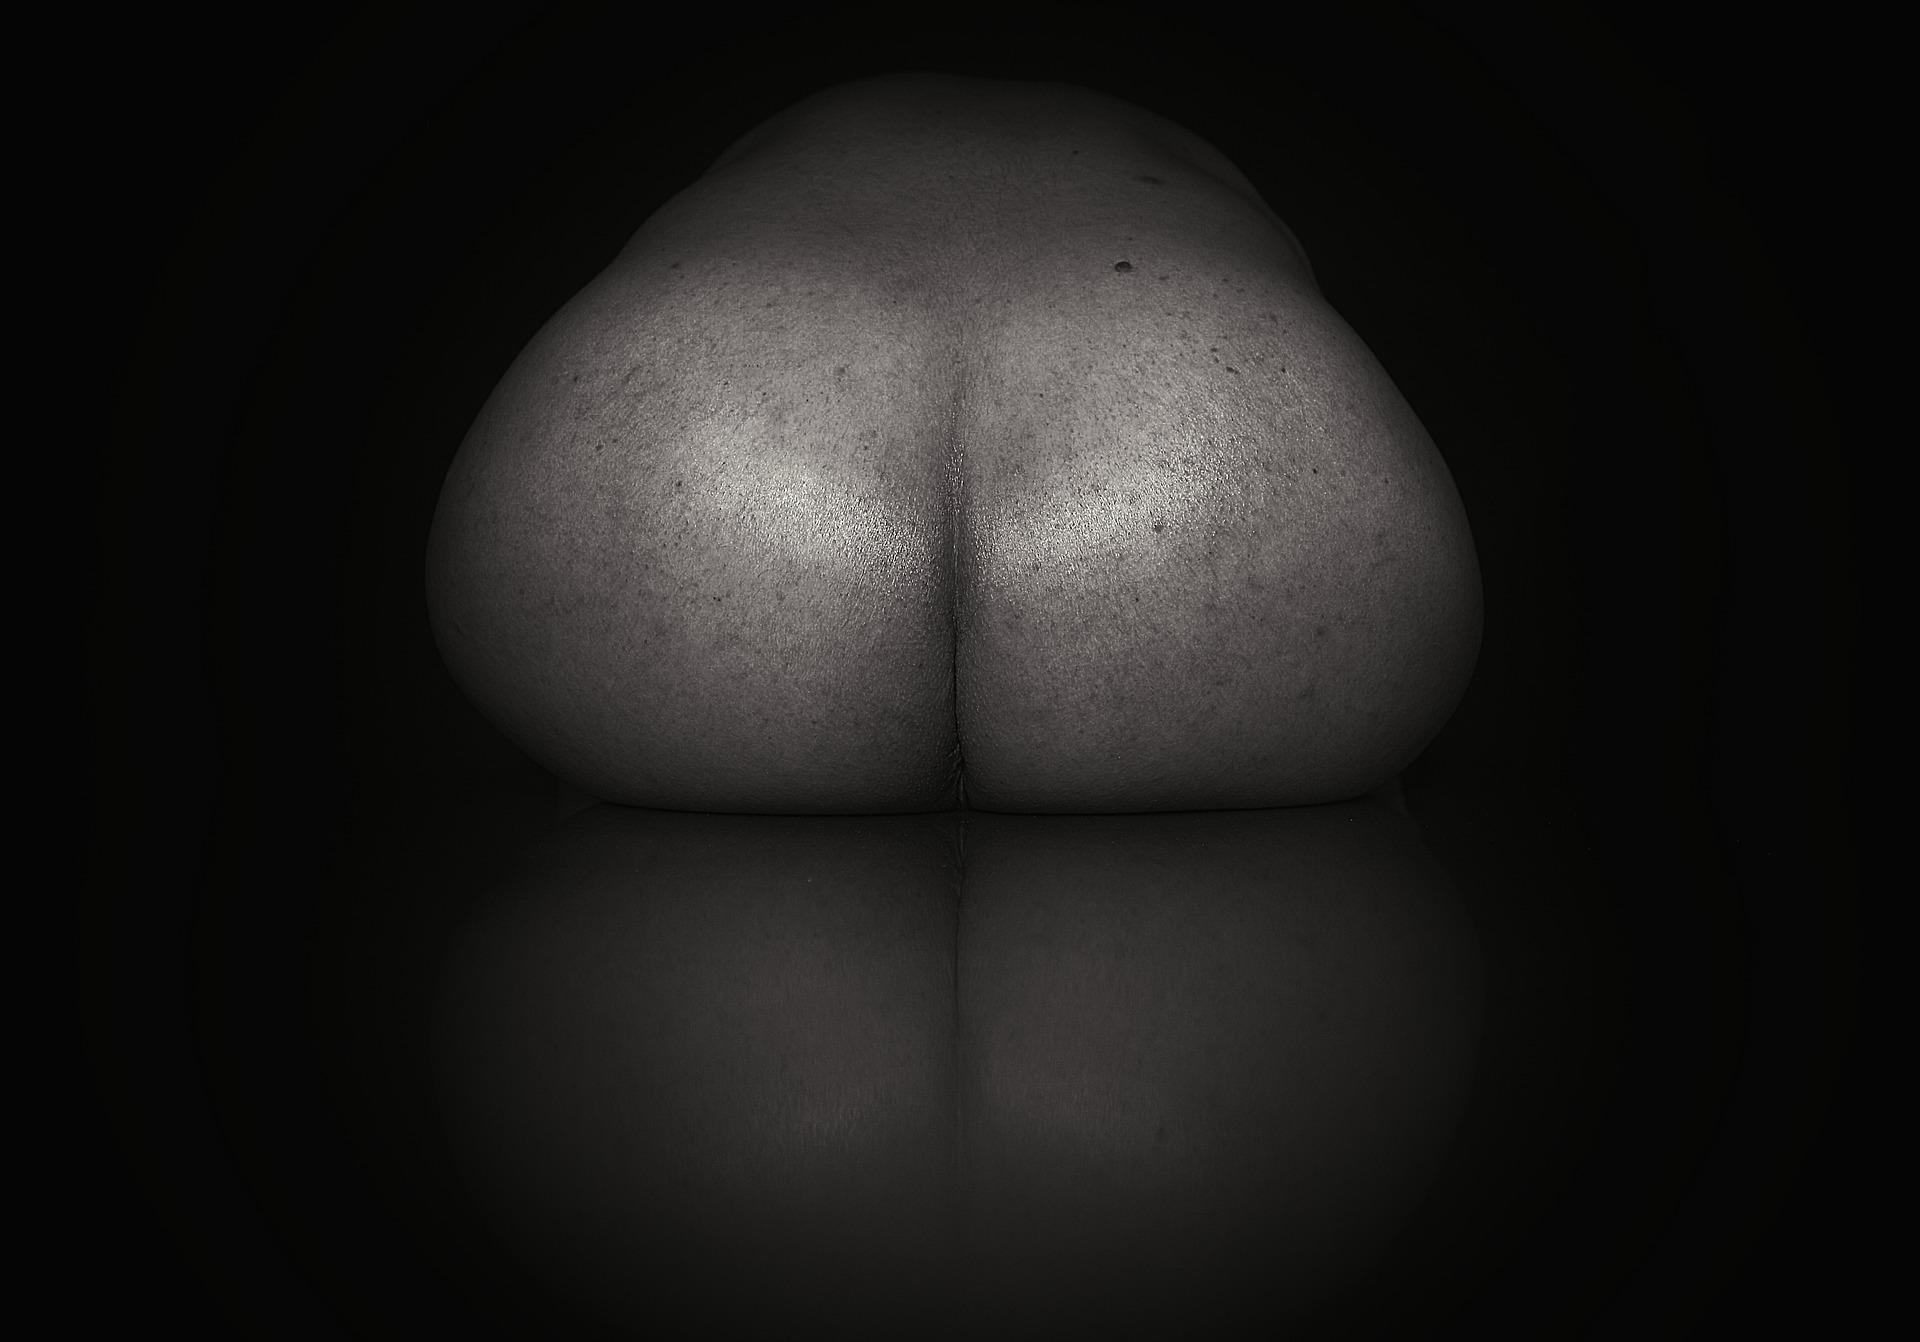 buttocks-5283849_1920